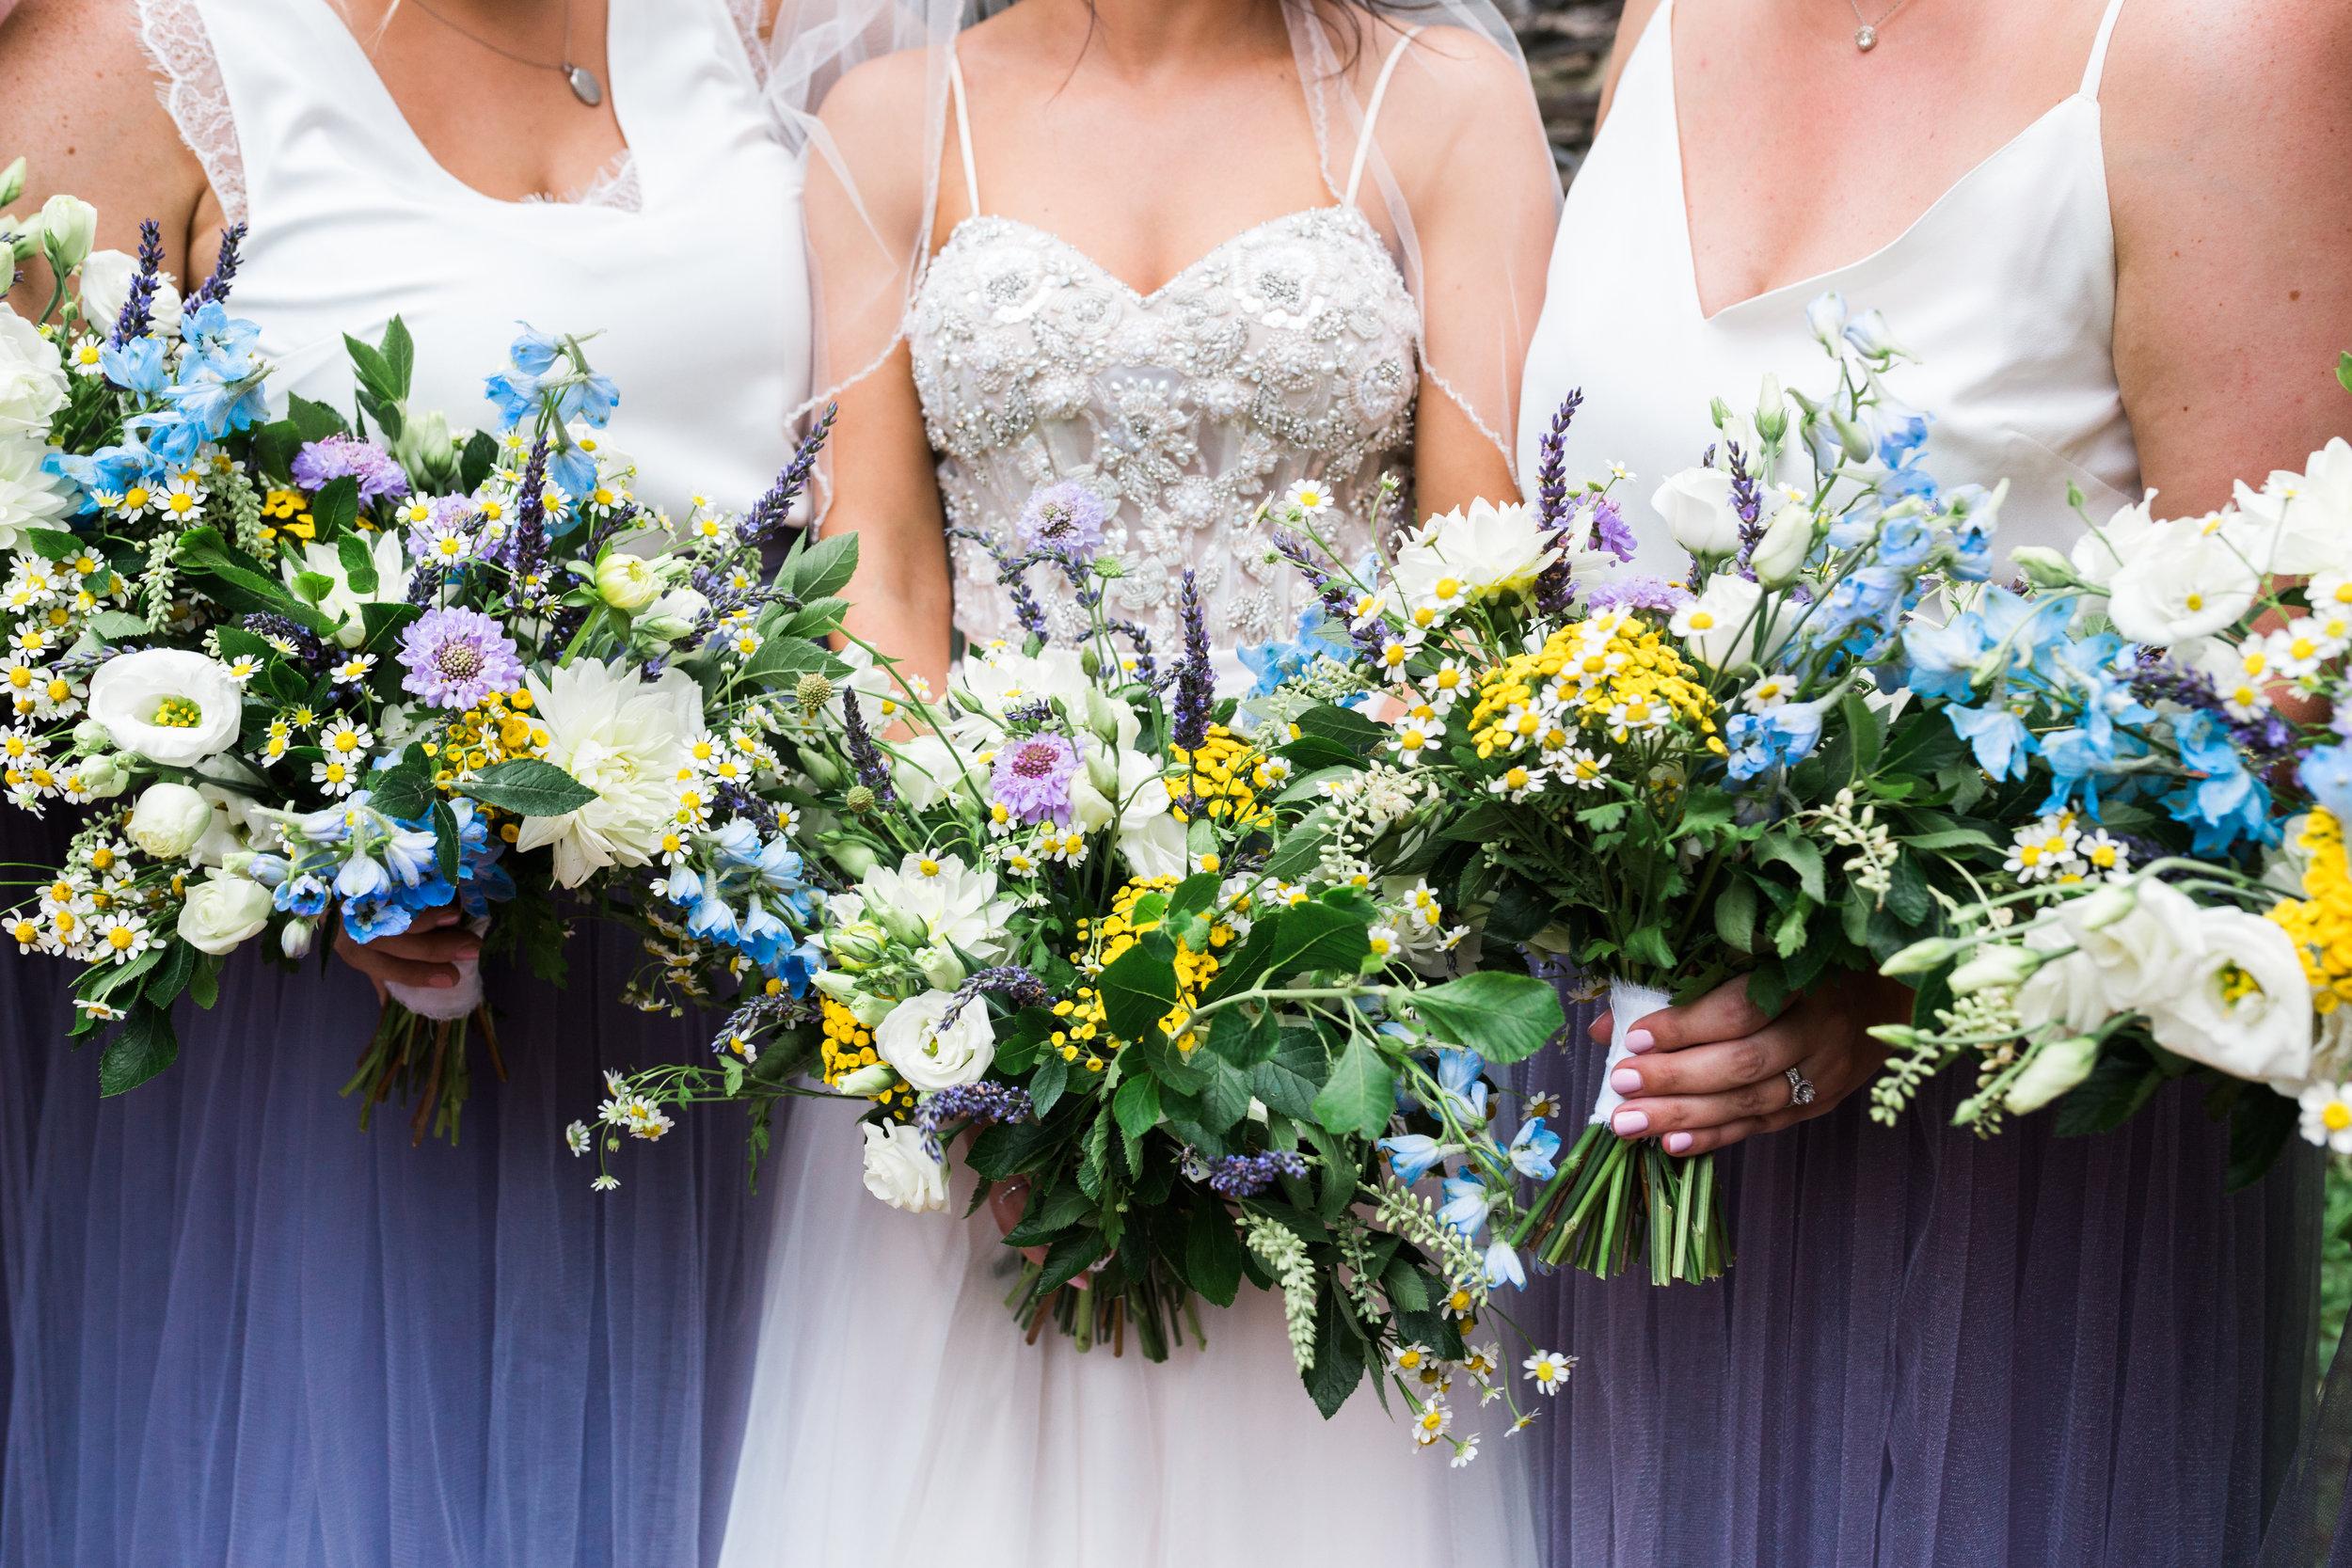 EGP-wedding-340 - Copy.jpg